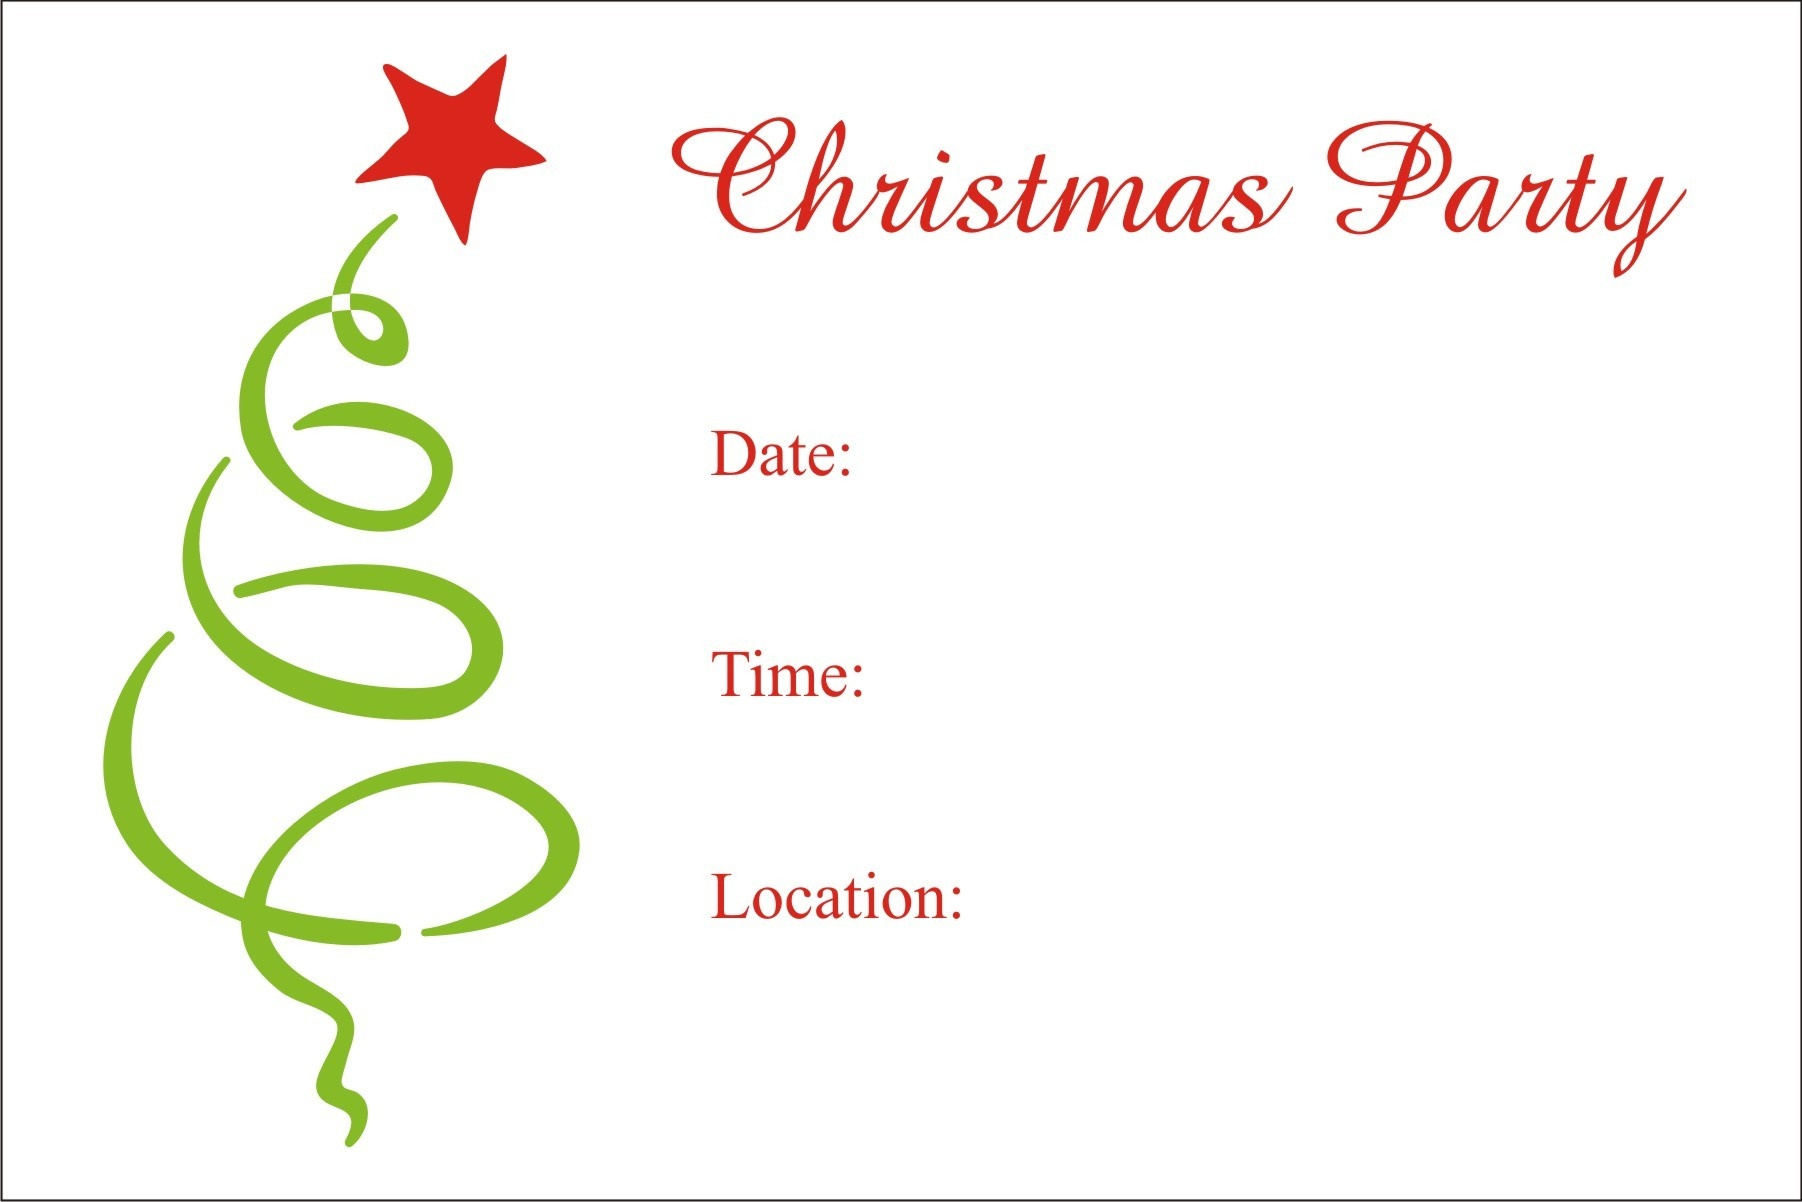 Christmas Party Free Printable Holiday Invitation Personalized Party - Free Online Printable Christmas Party Invitations